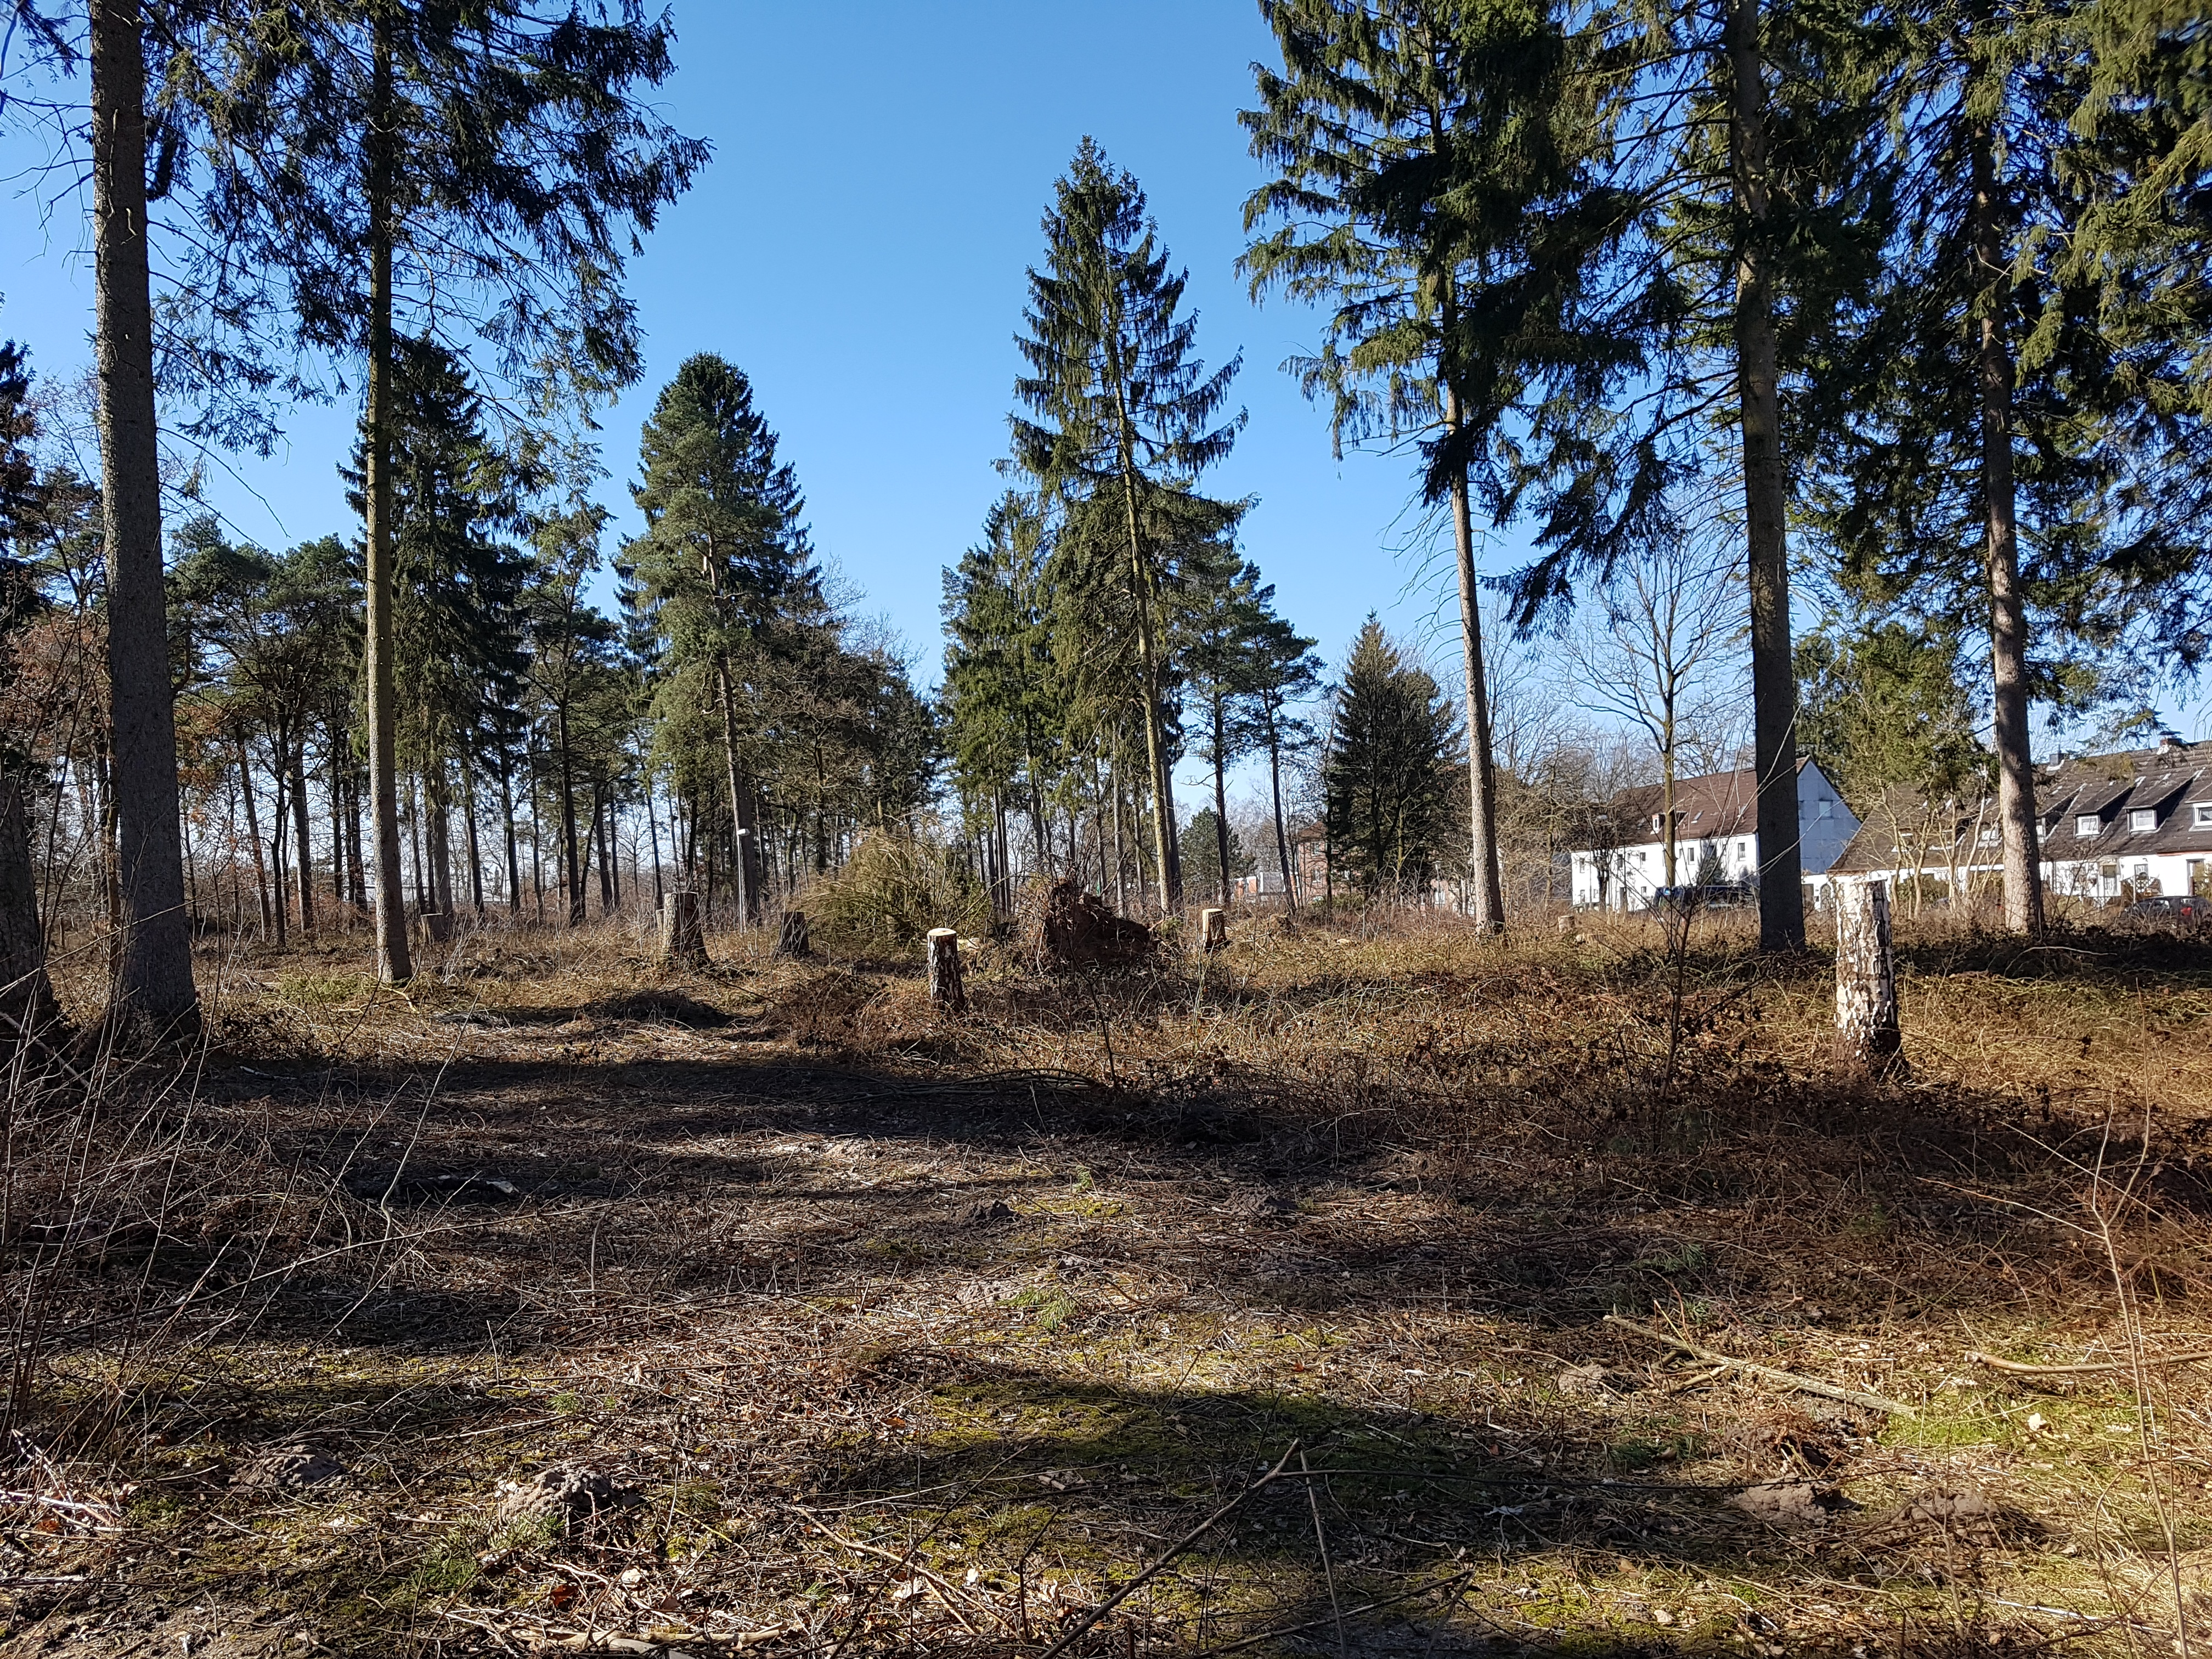 Der Wahlstedter Stadtwald